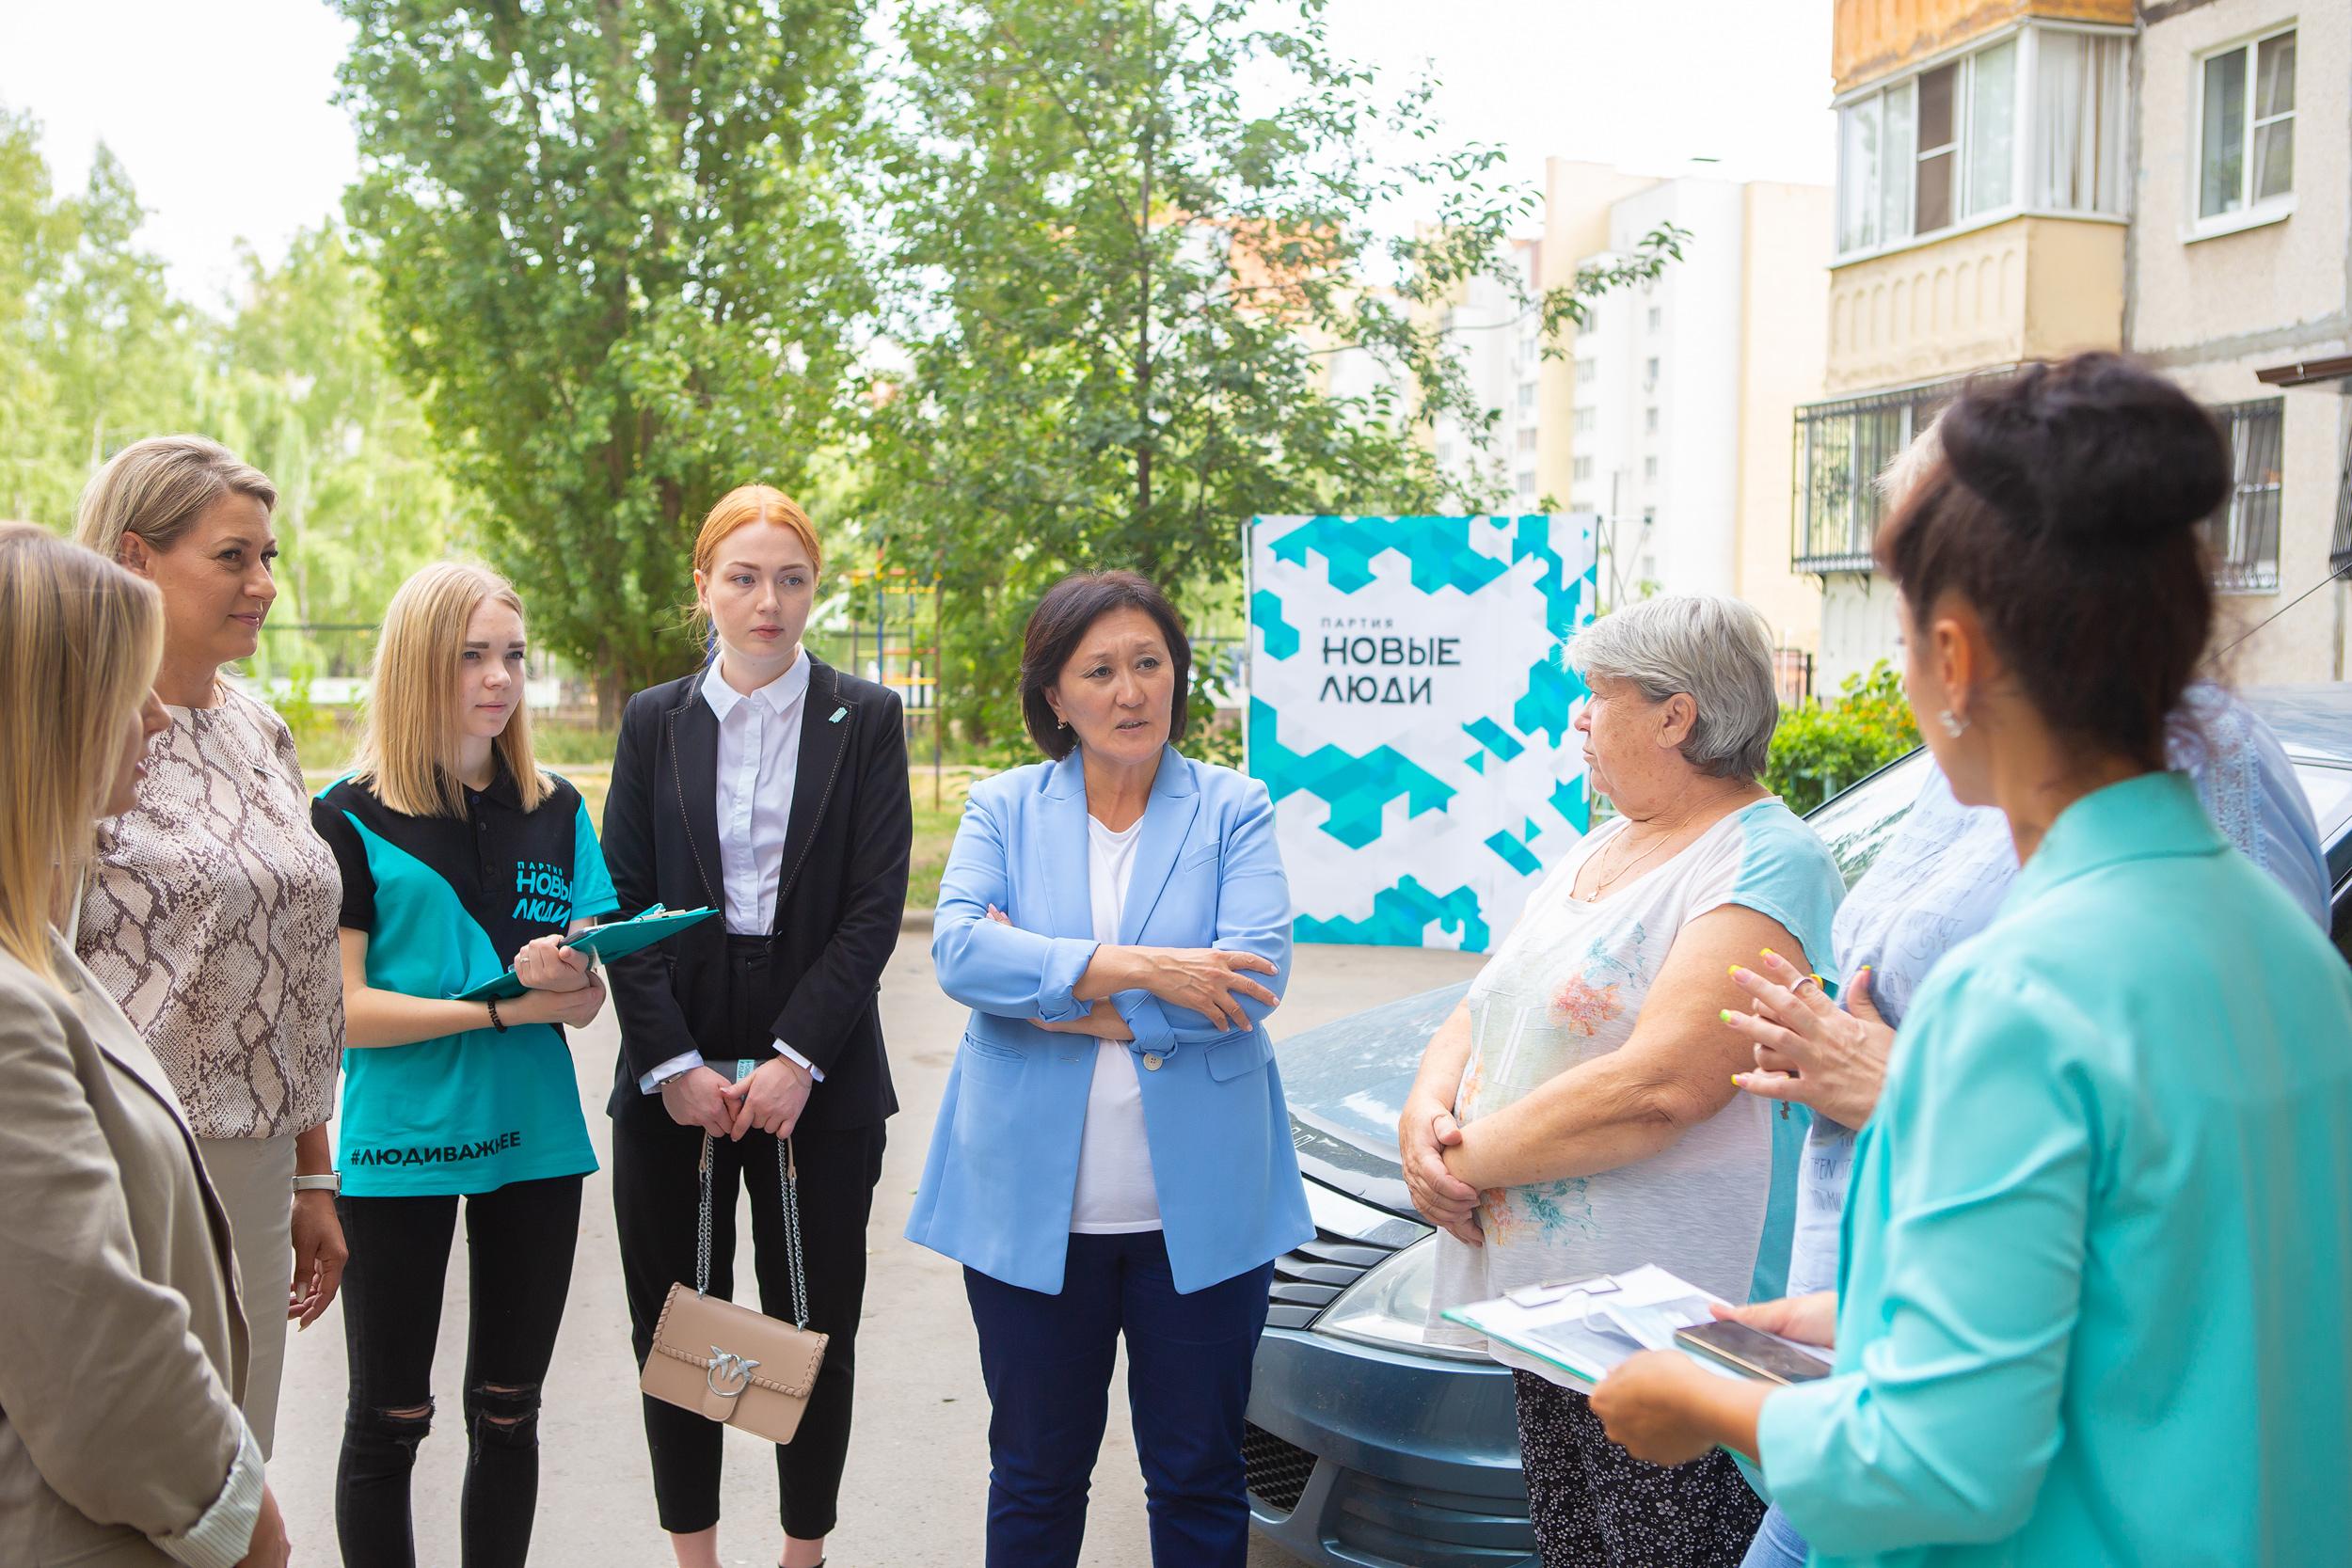 Установка в доме автоматизированного теплового пункта позволила снизить плату за ЖКХ на 1500–2000 тысячи рублей